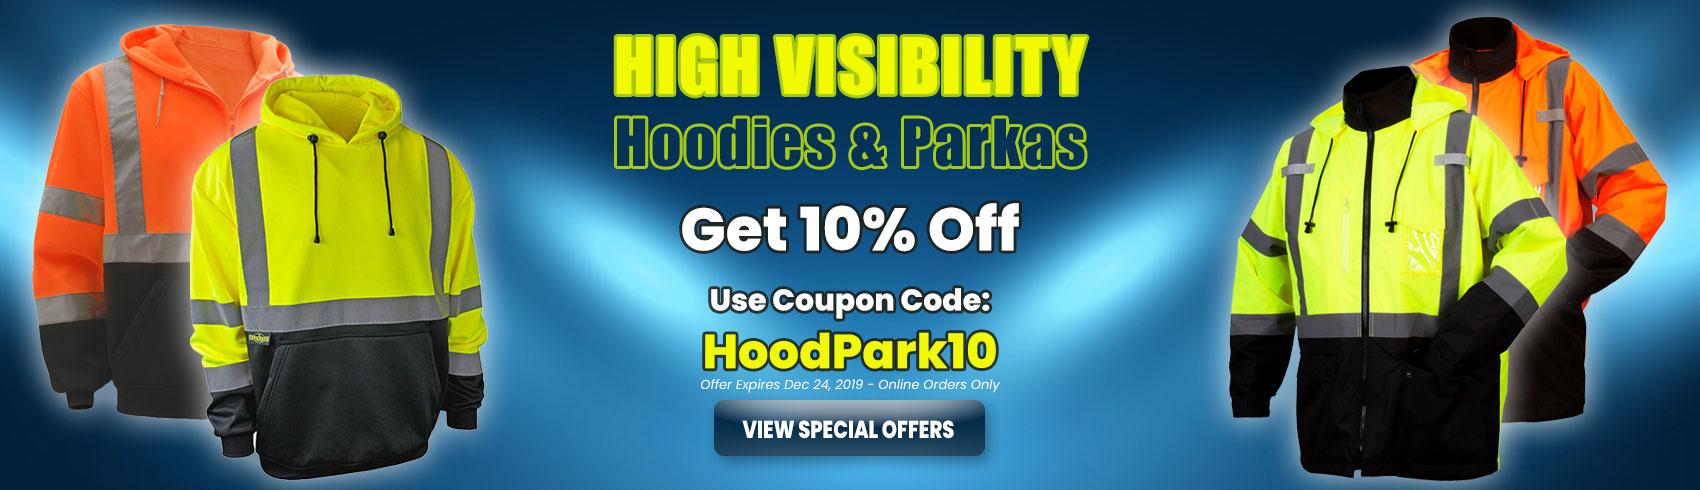 Hi Vis Hoodies and Parkas Special Offer